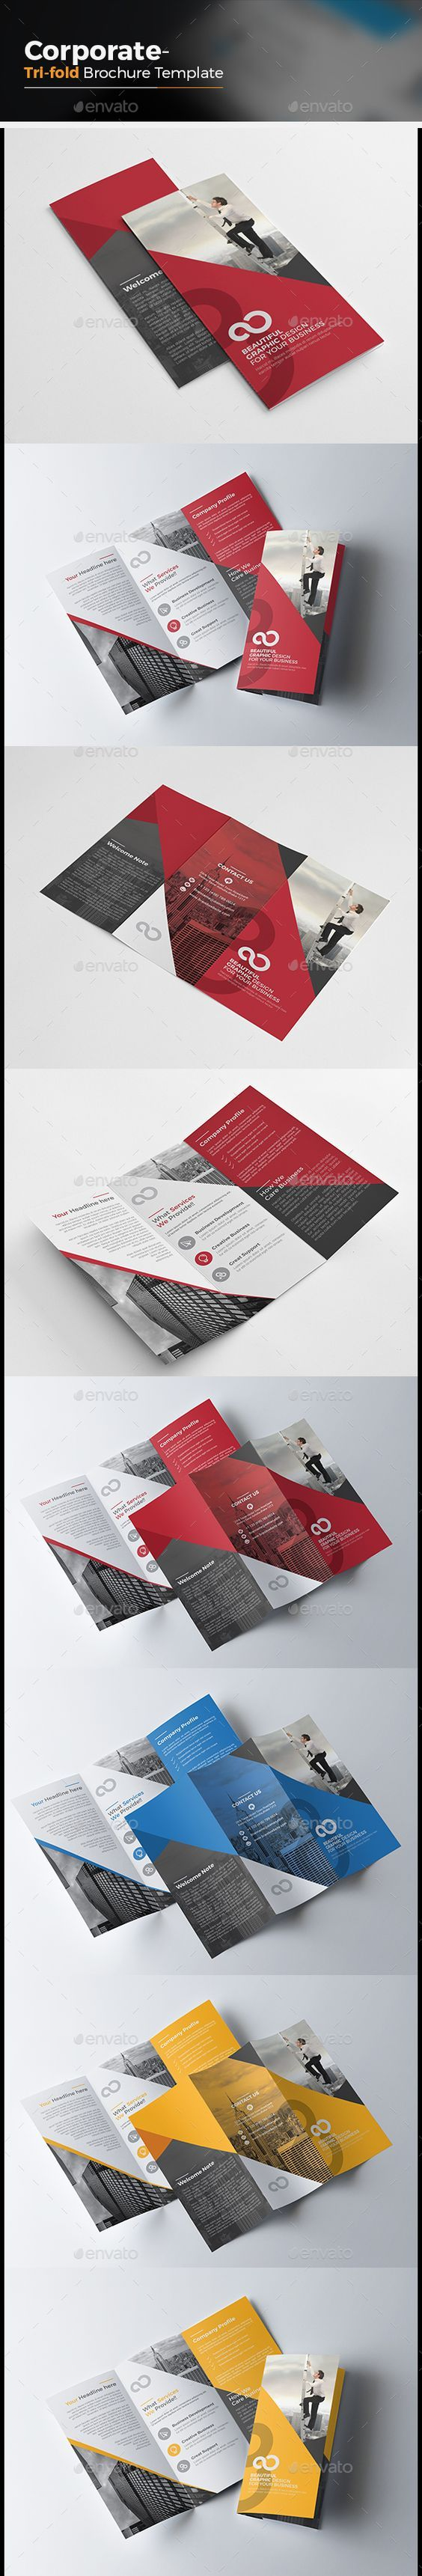 Corporate Tri fold Multipurpose Brochure Template Vector EPS, AI #design Download: http://graphicriver.net/item/corporate-tri-fold-multipurpose-brochure/13991747?ref=ksioks: